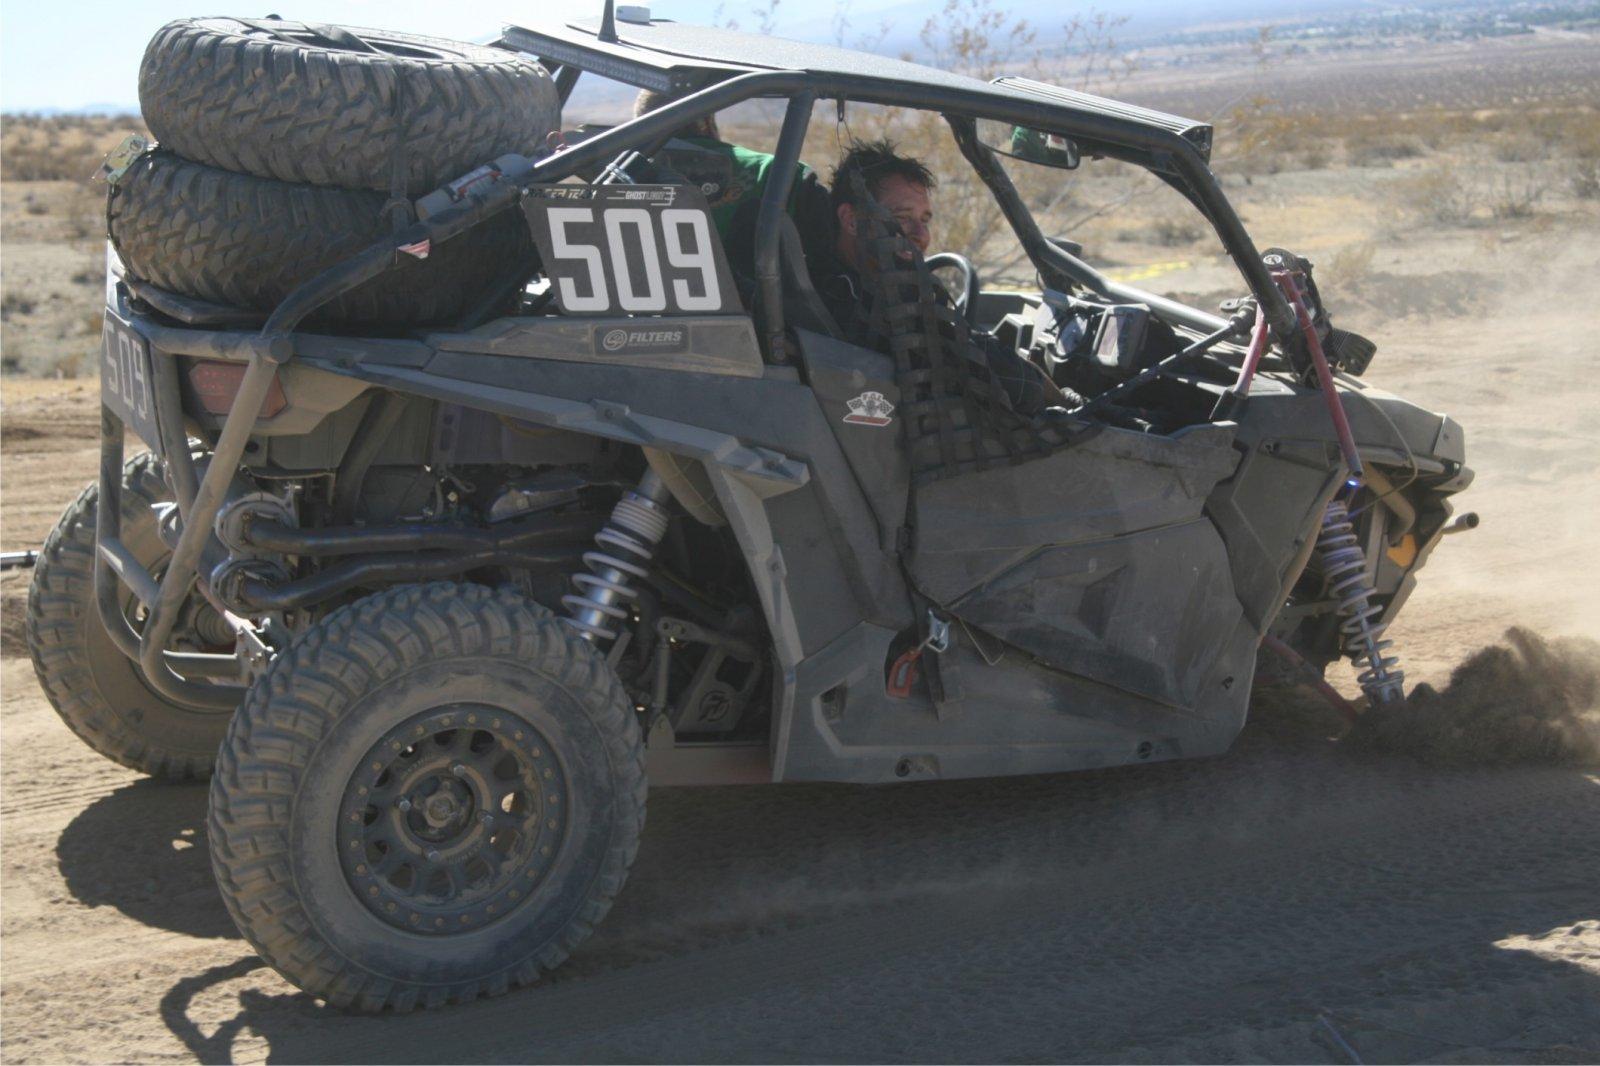 16-Ake-Finis3-wheels-Sep15.JPG